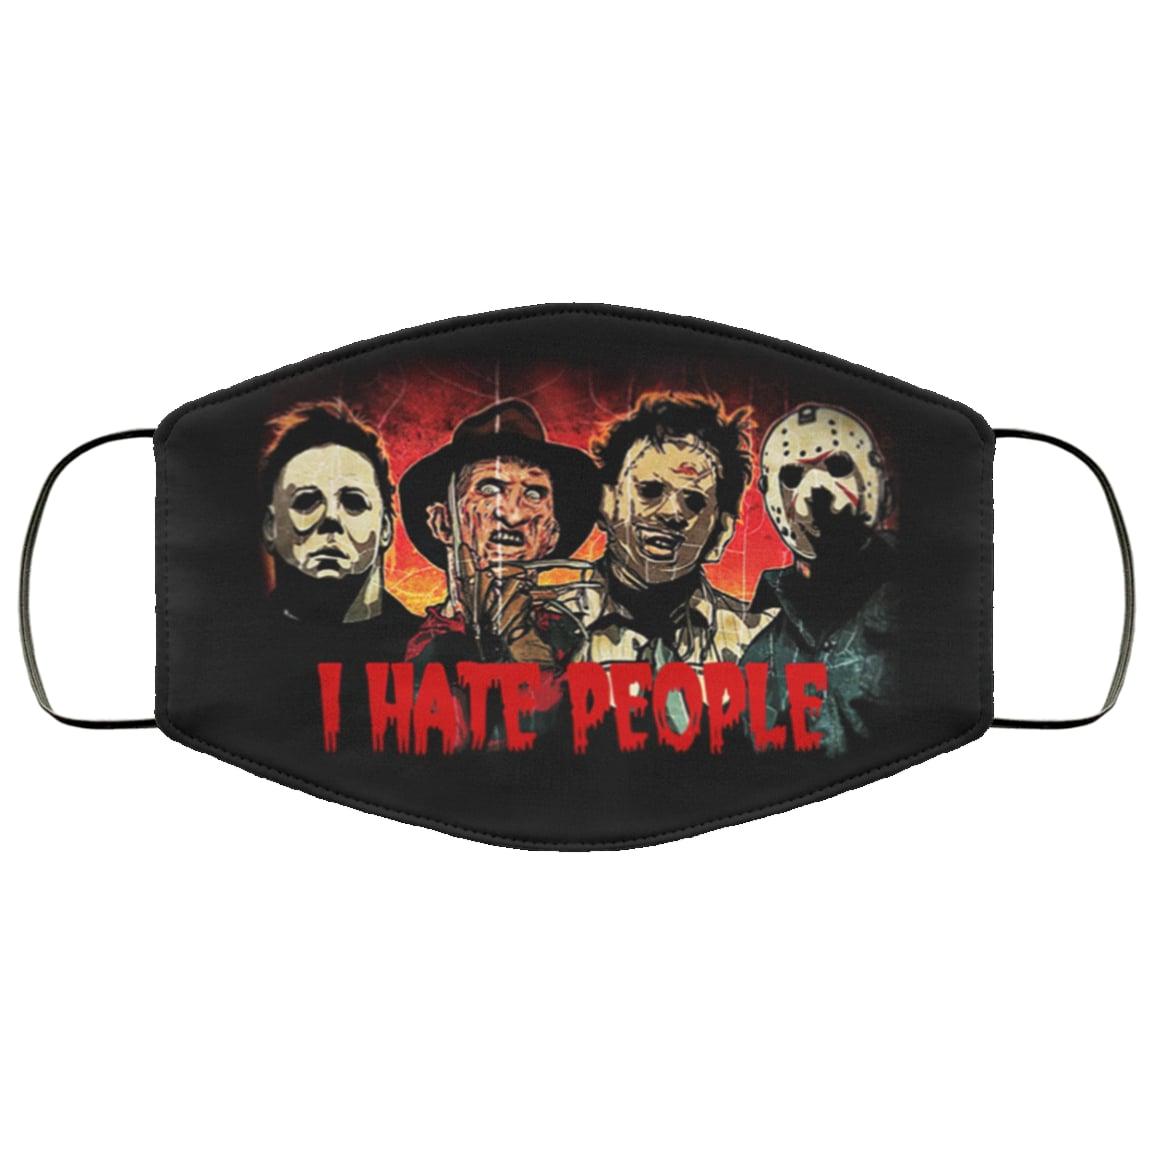 I hate people horror jason michael myers leatherfaces freddy face mask 2